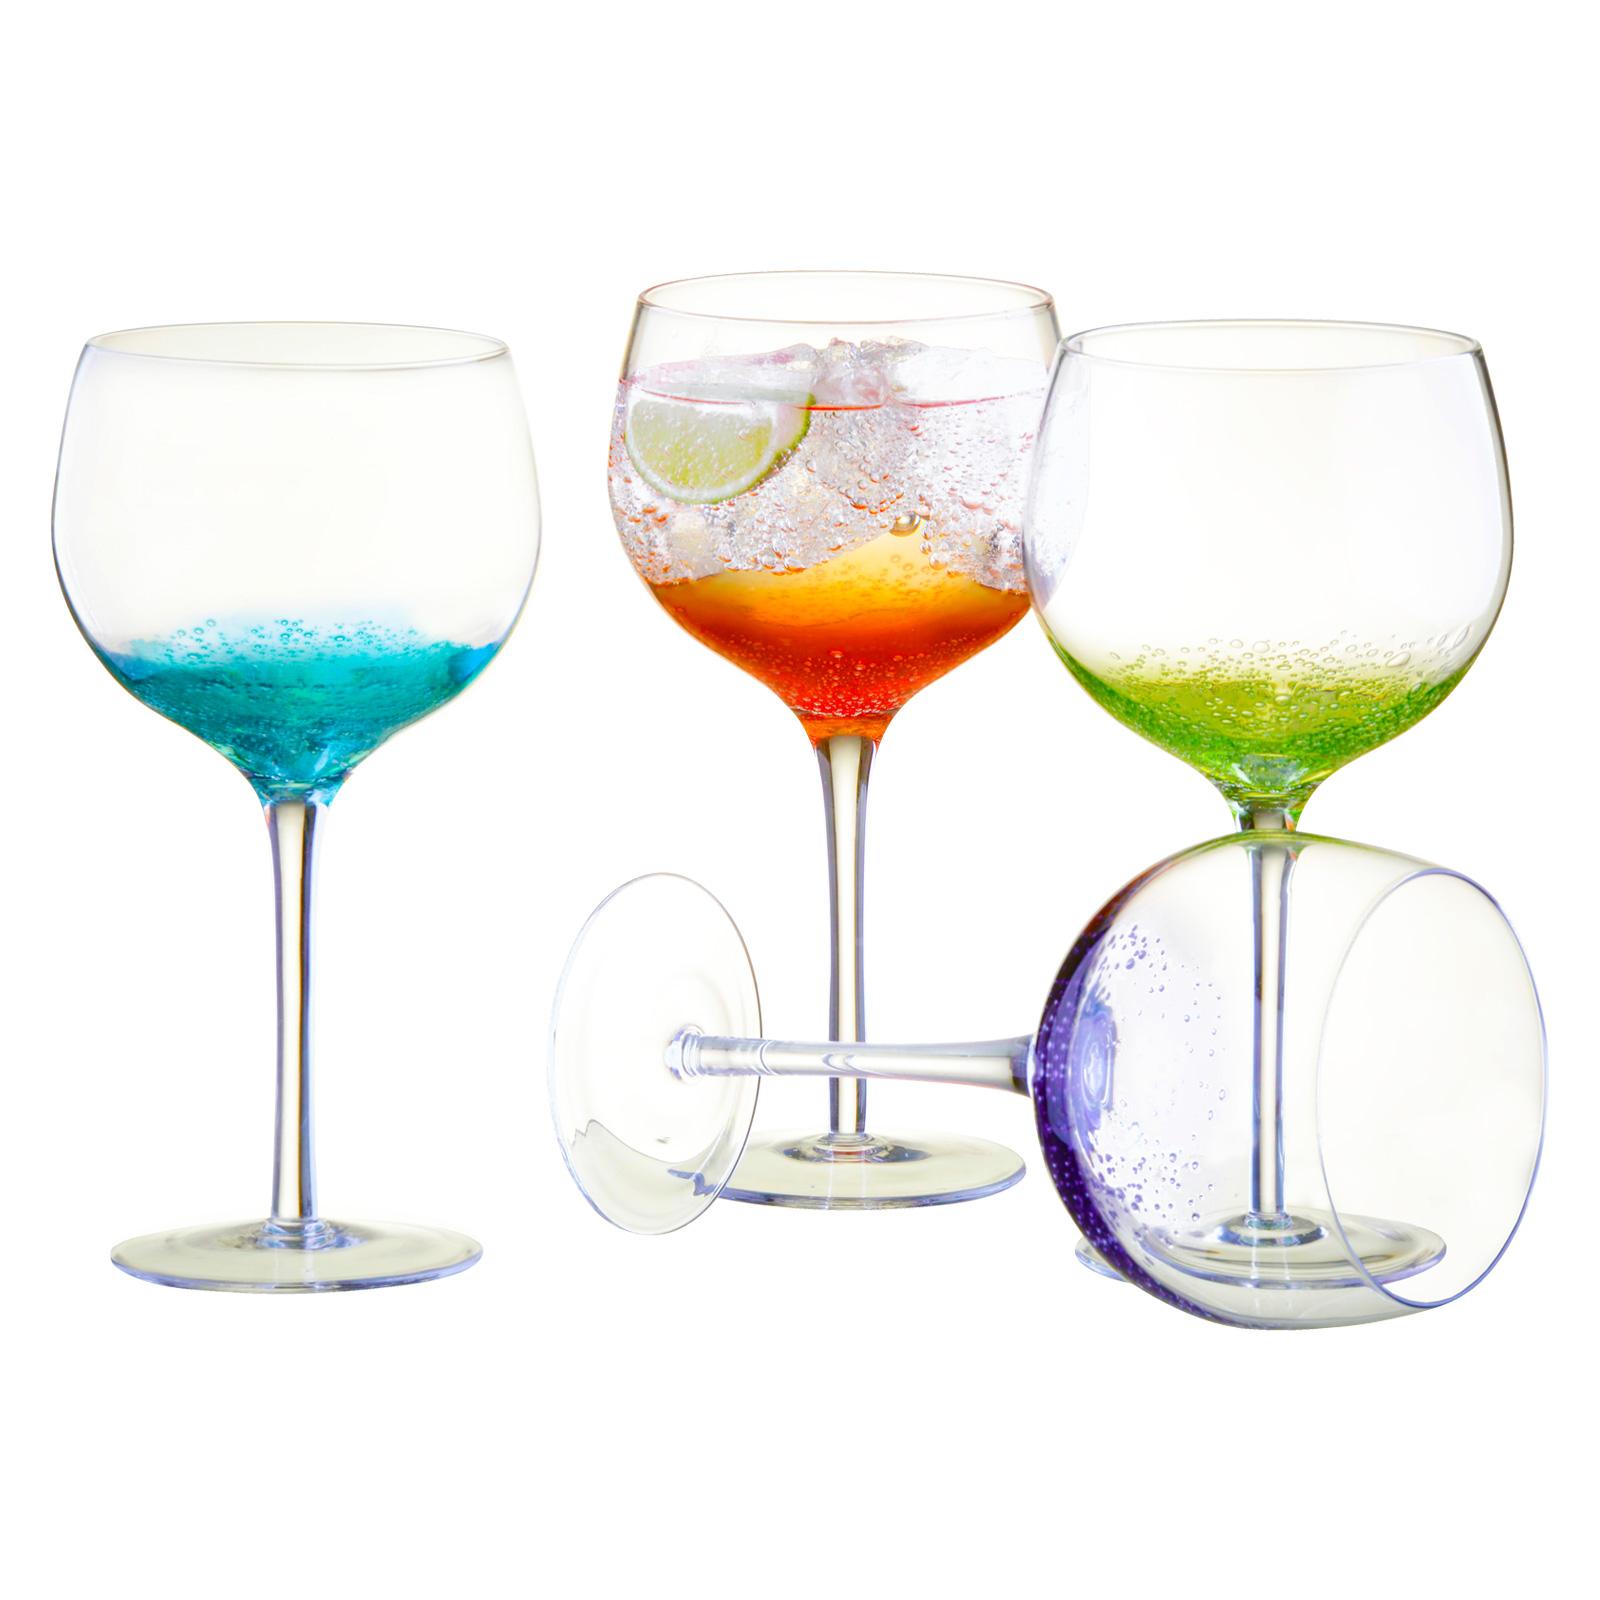 Fizz Gin Glasses - Set of 4